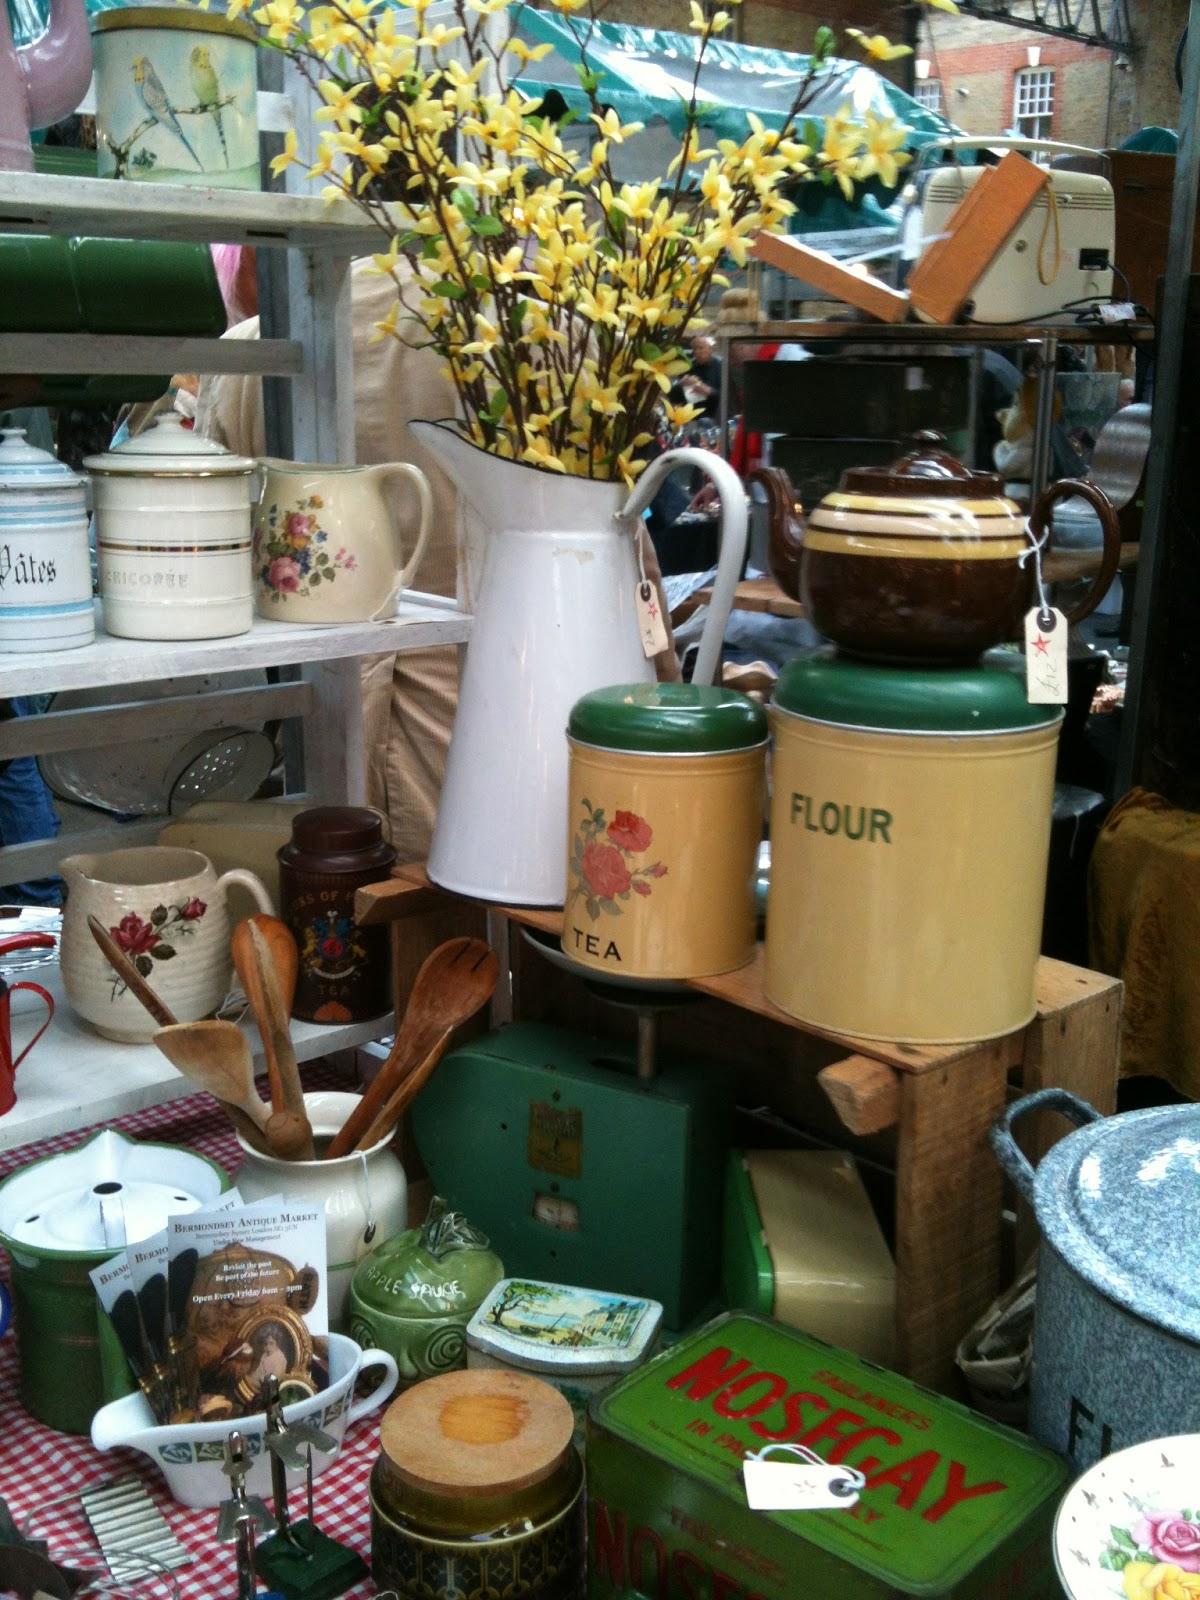 Vintage kitchenware - Wednesday May 22 2013